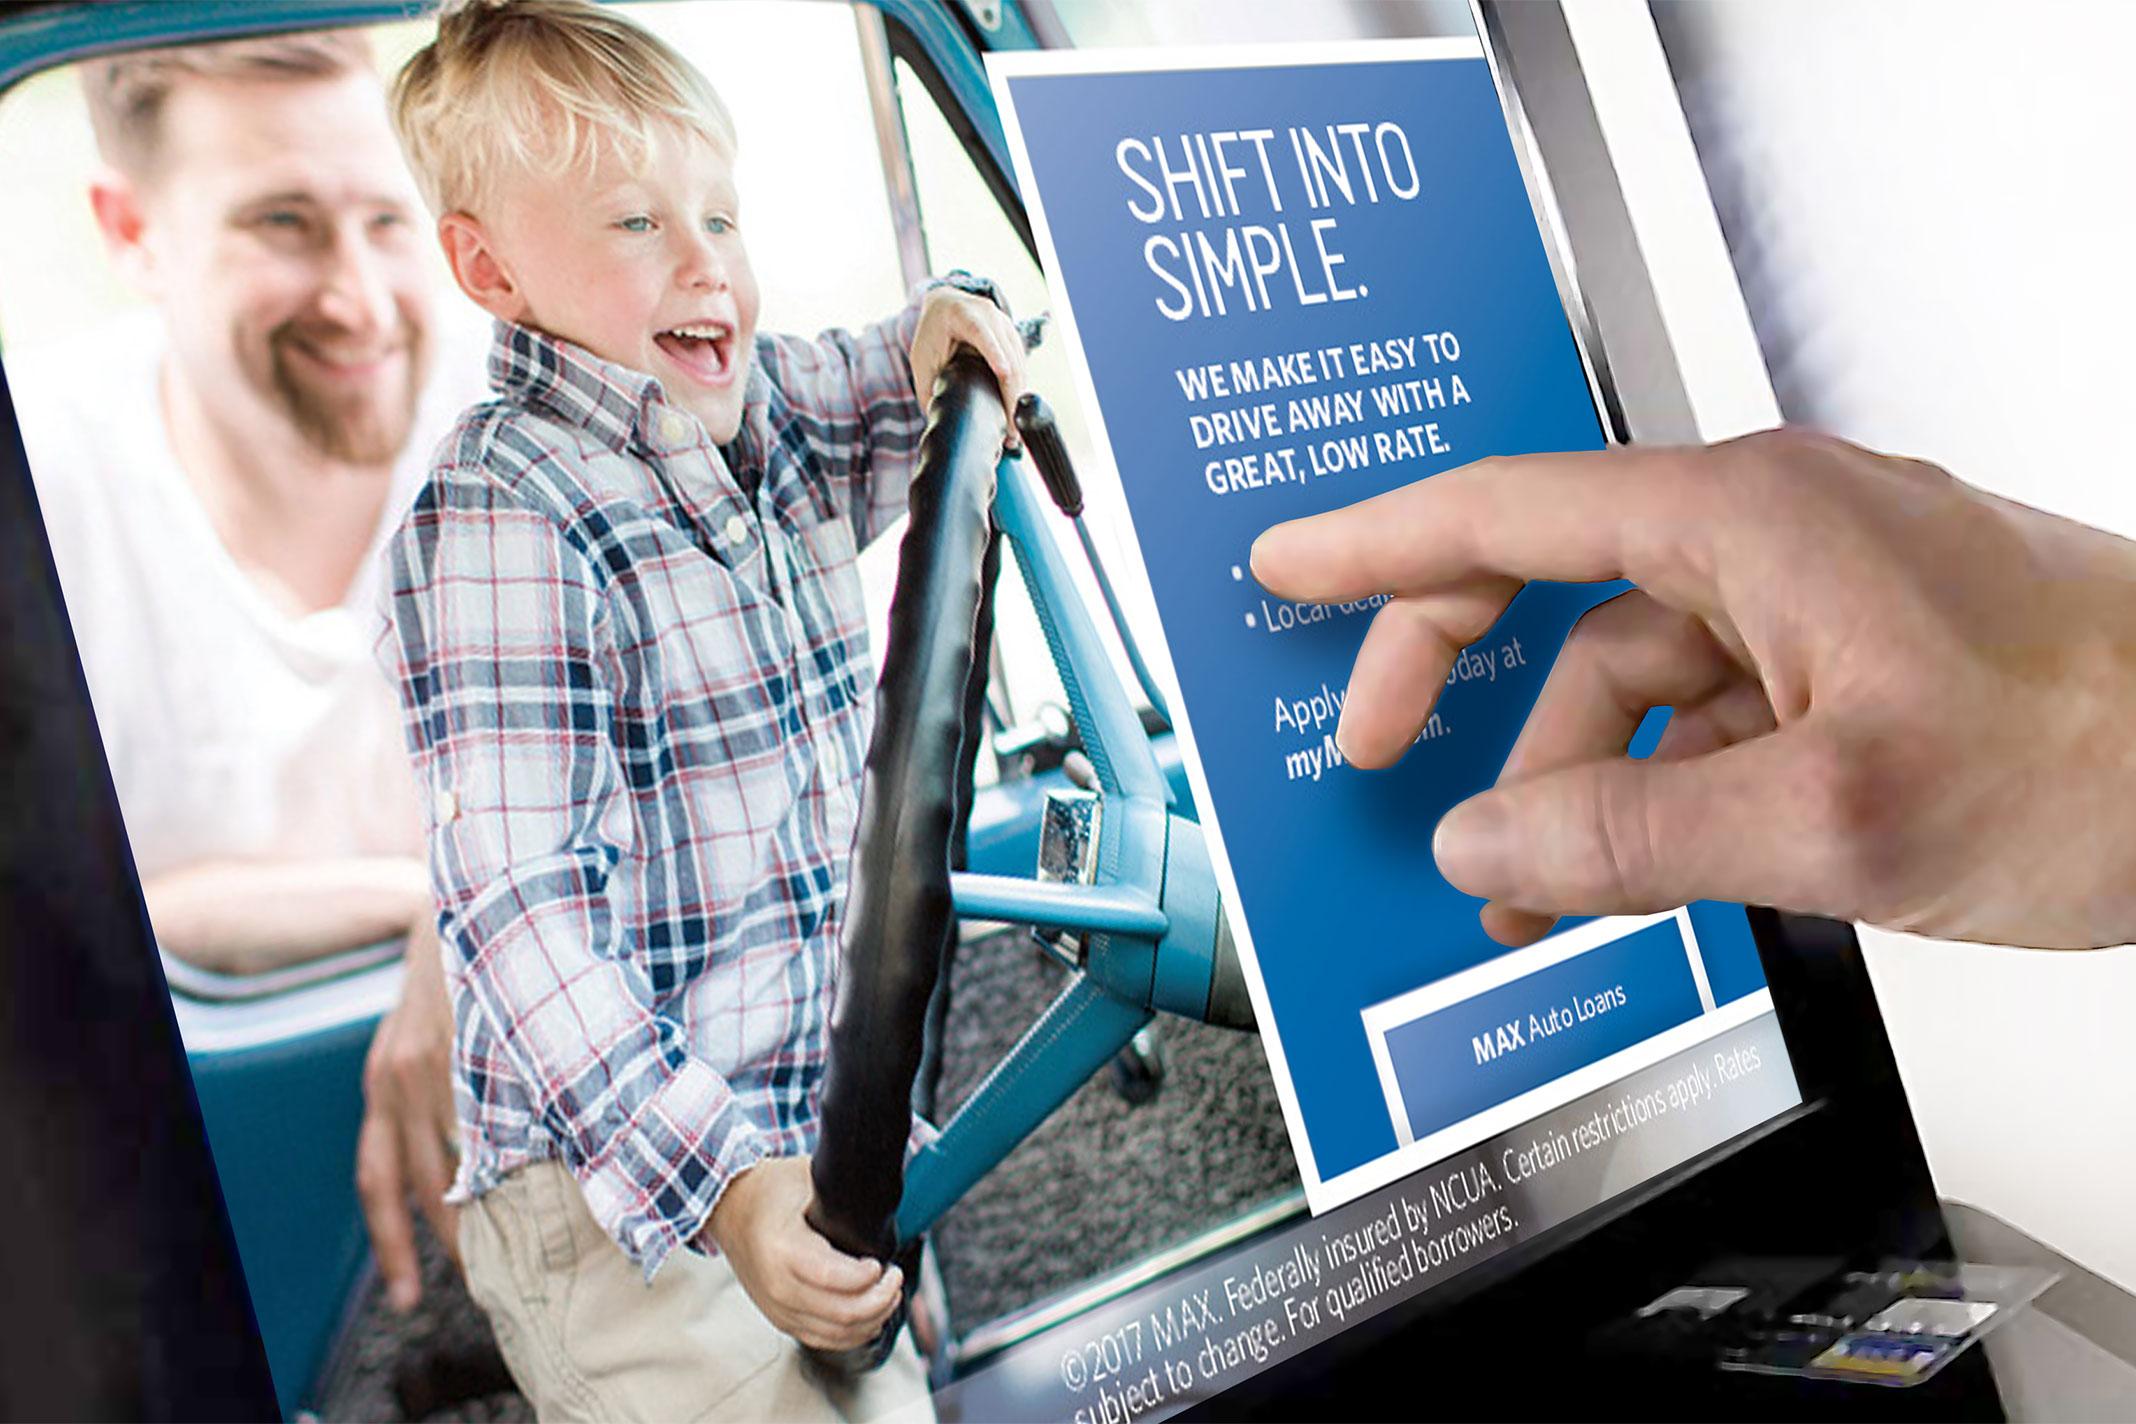 Max Credit Union ATM screen – Shift Into Simple.